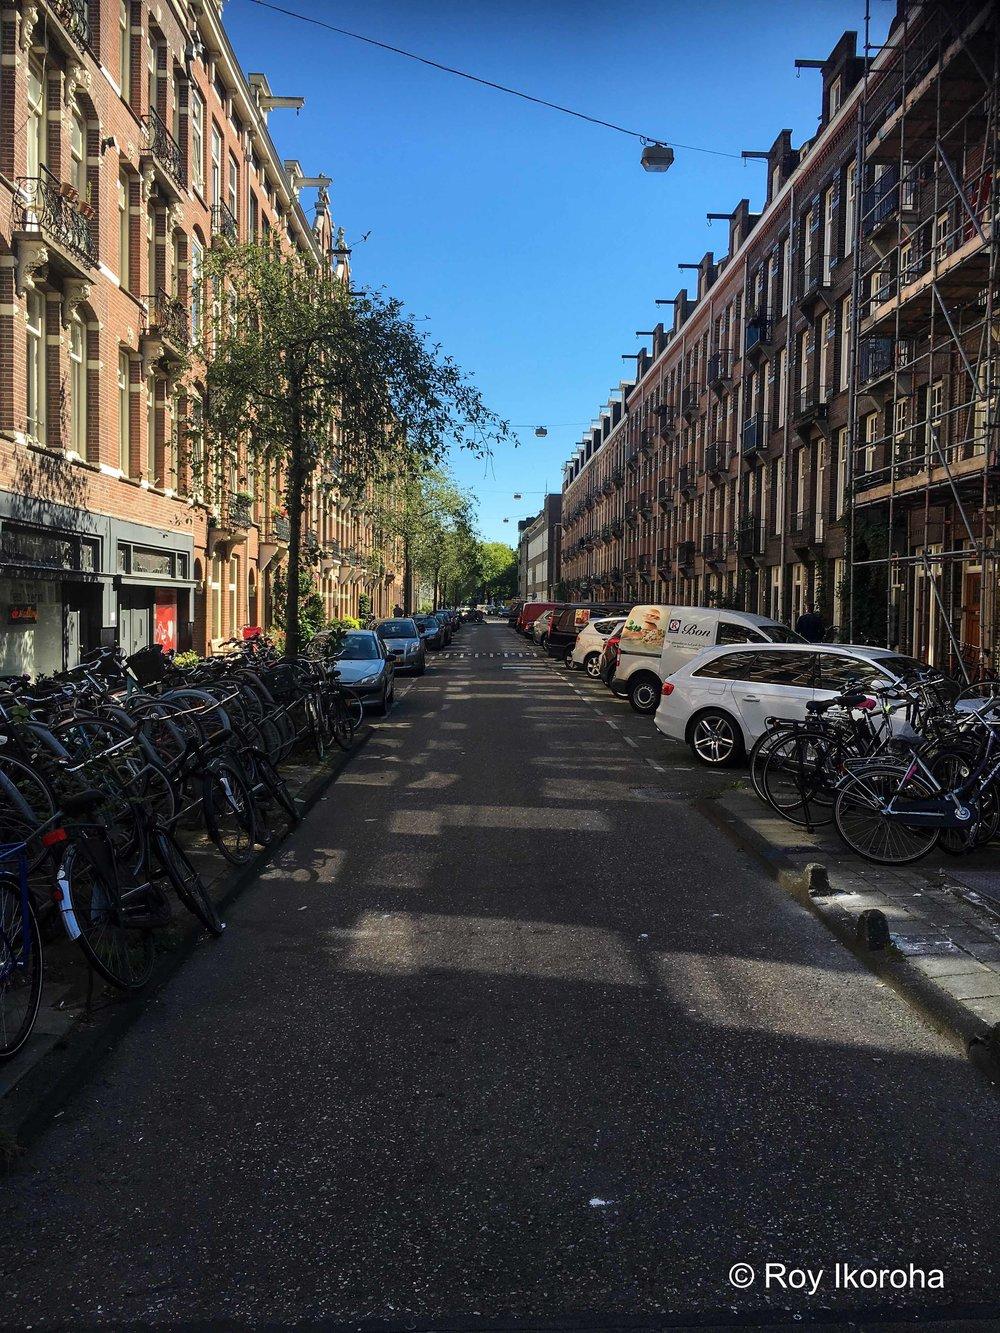 Derde Helmersstraat, Amsterdam, Netherlands